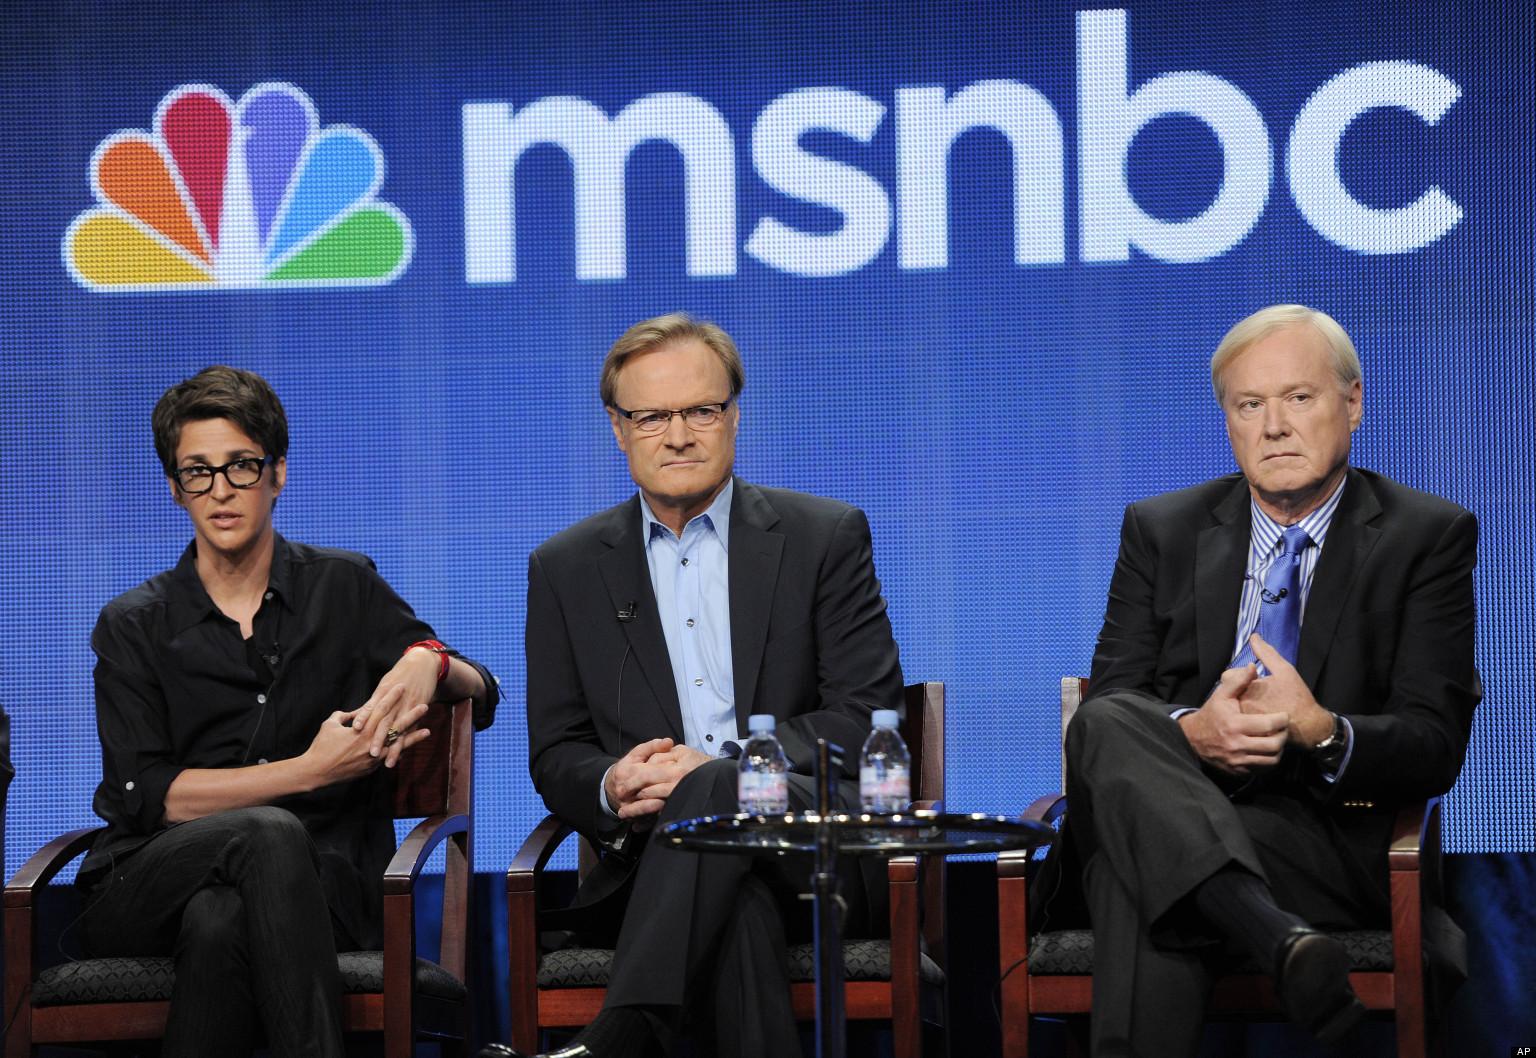 Rachel Maddow, Chris Matthews, Lawrence O'Donnell